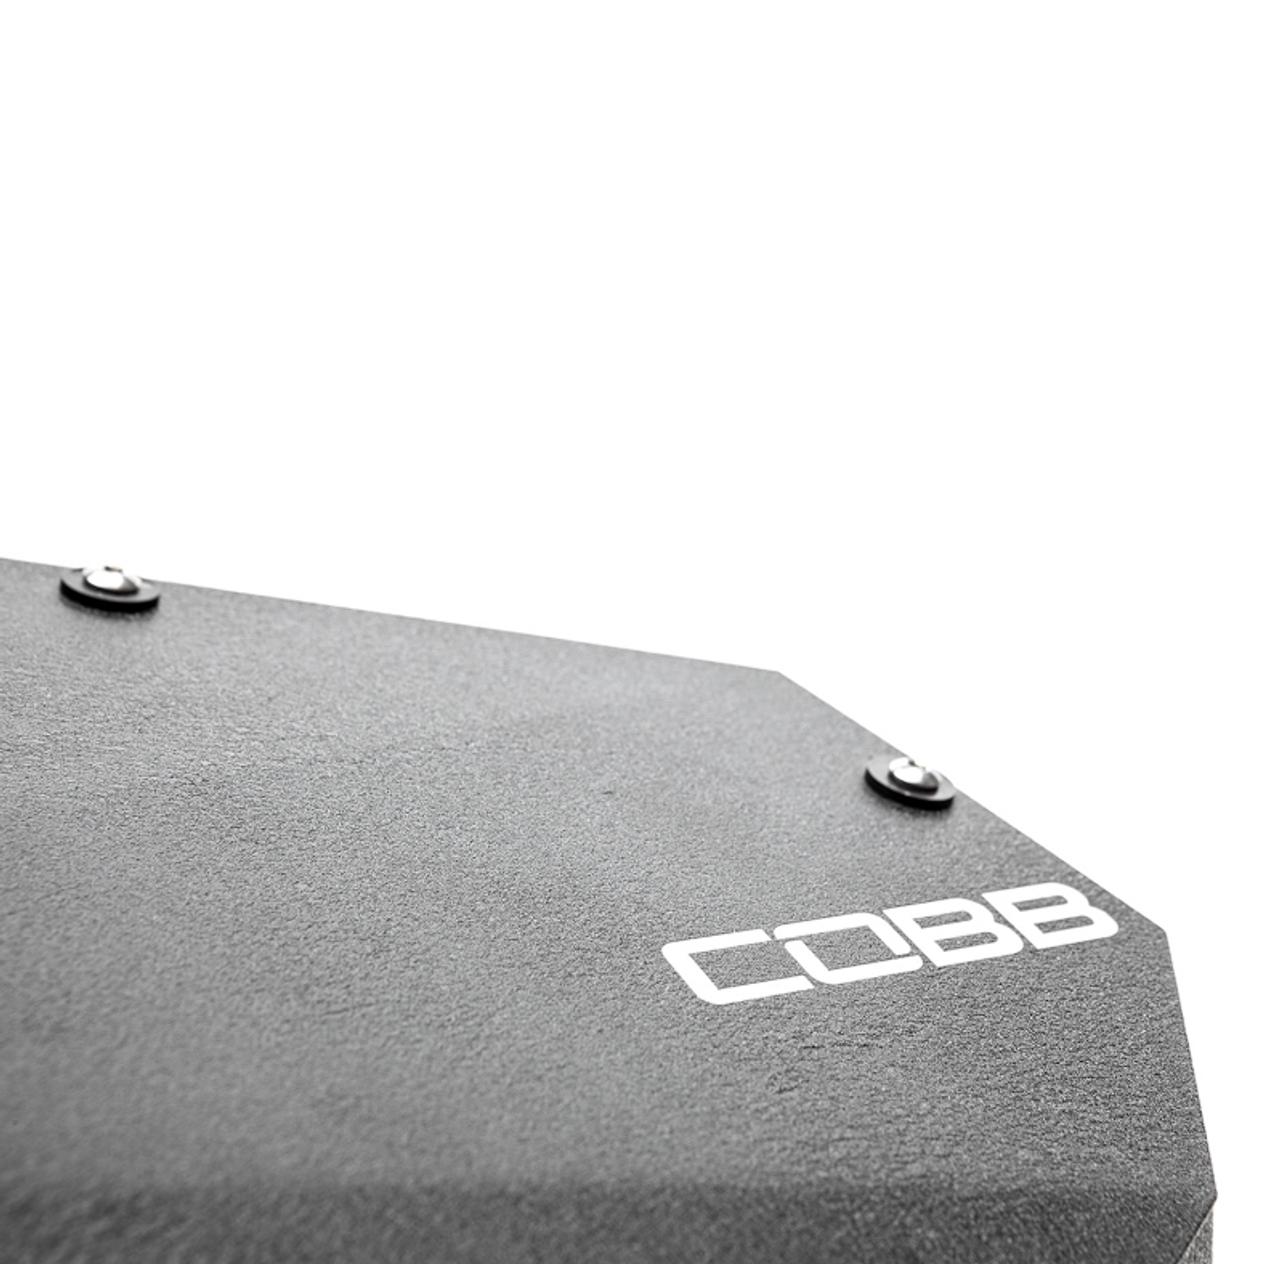 Cobb SF Intake System 15-17 Volkswagen GTI & Golf R (MK7) USDM (7V2150)